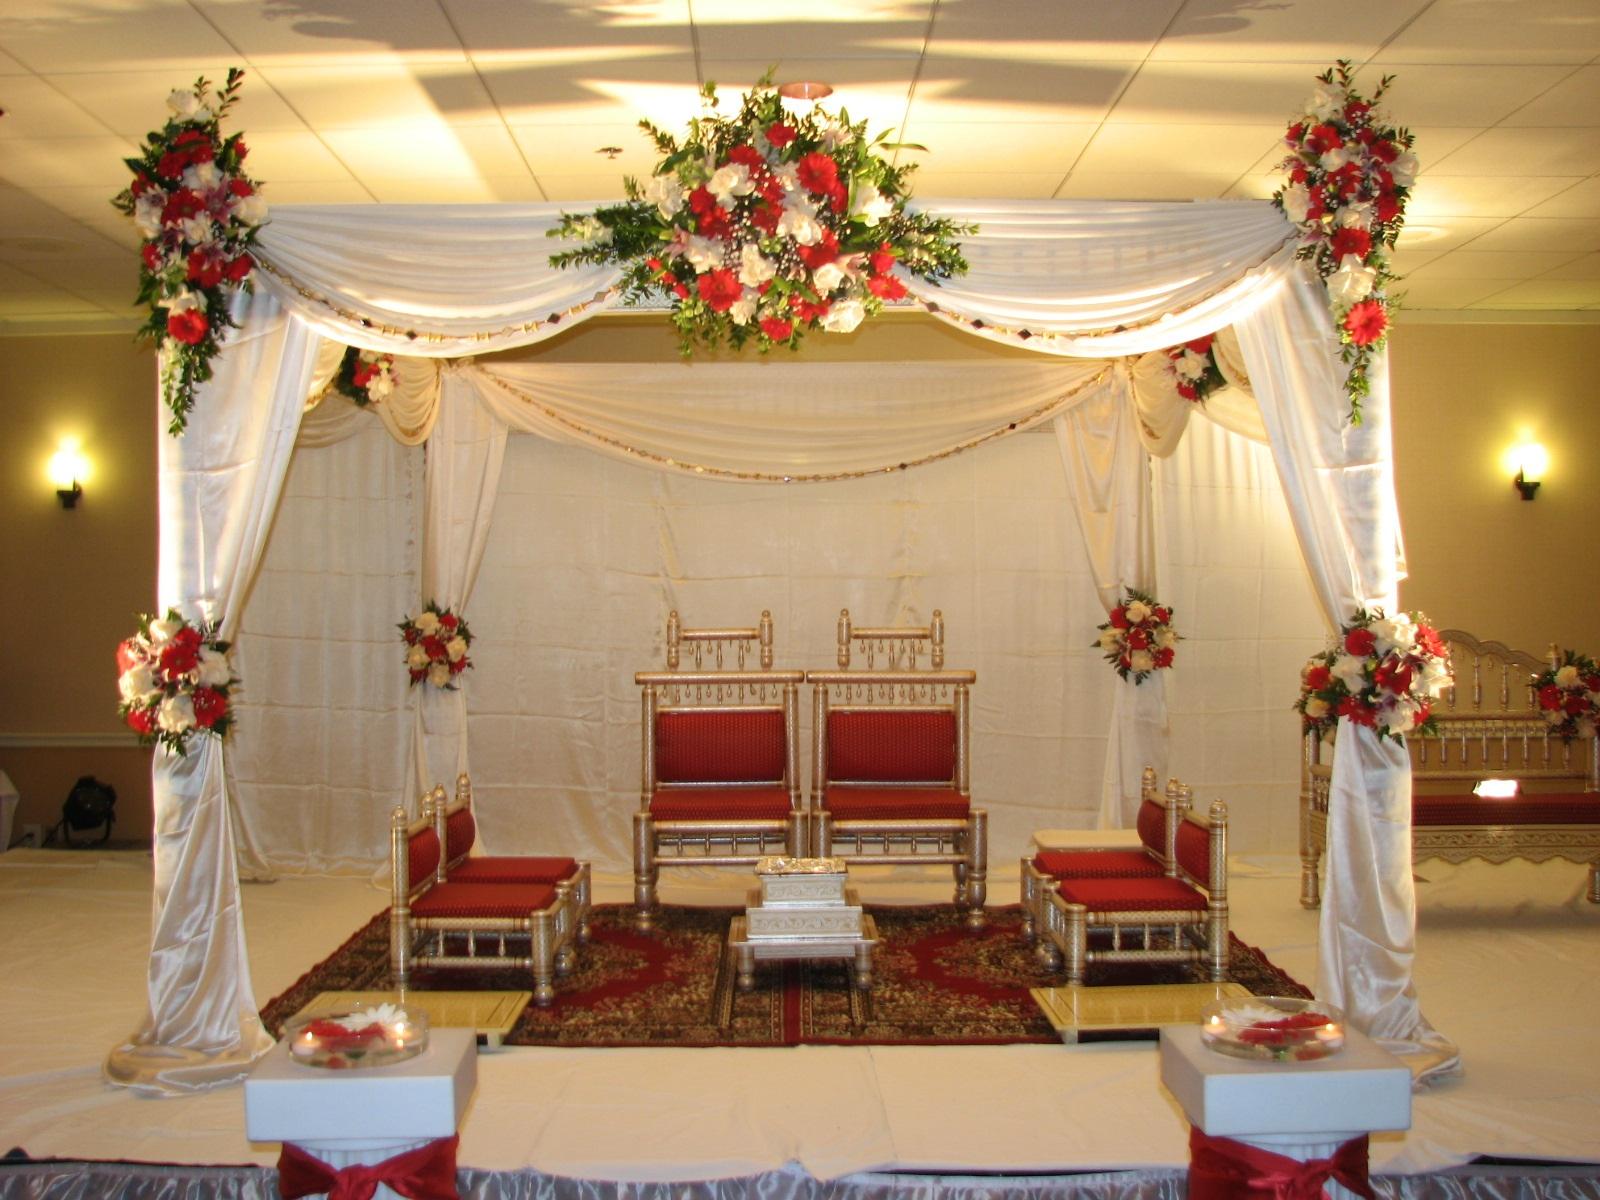 Decoration Ideas For Wedding